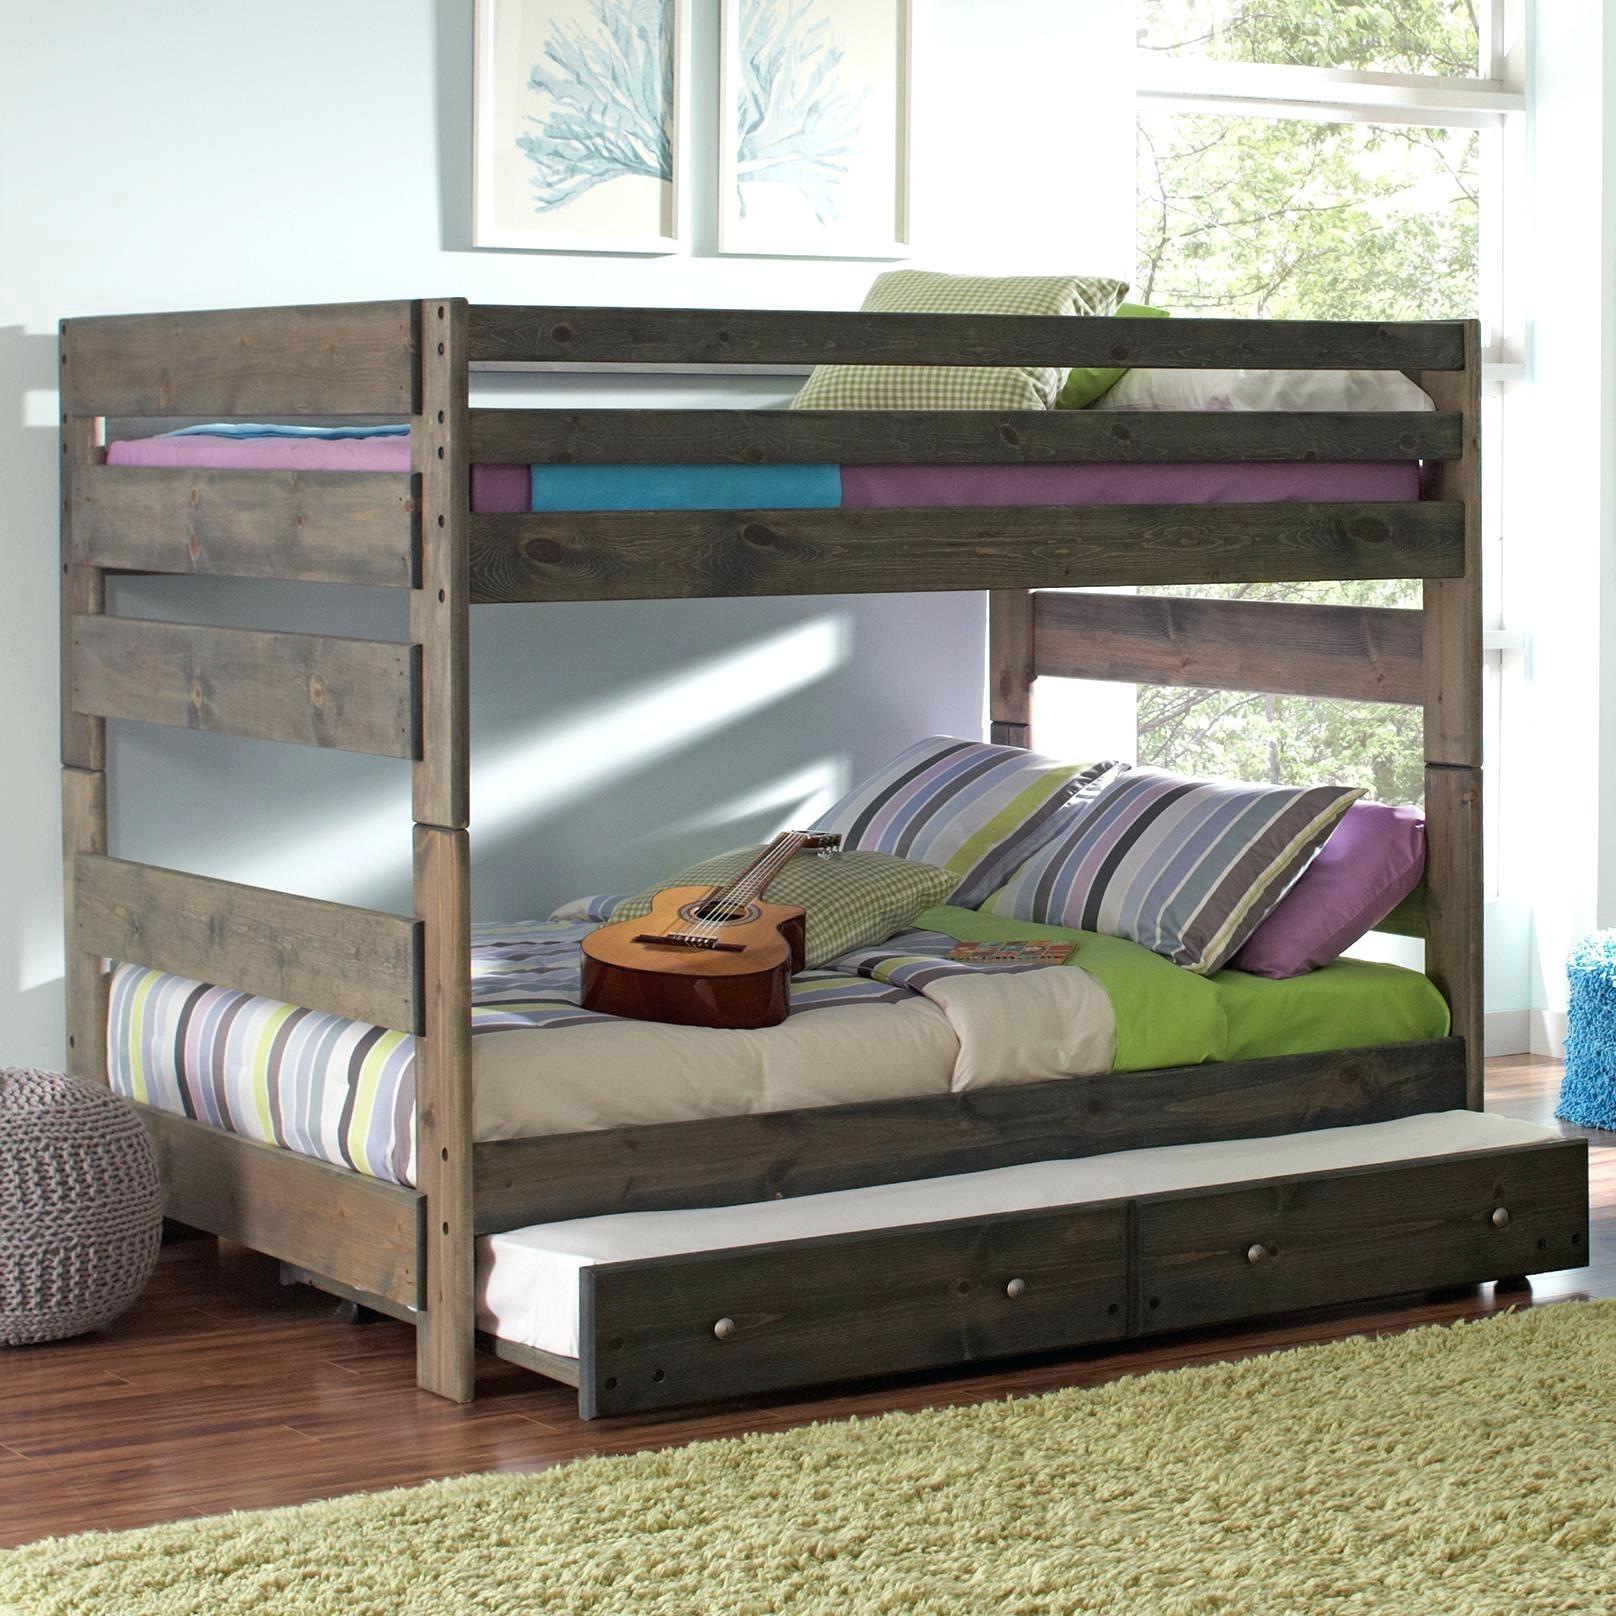 Slide-Out Bunk Bed